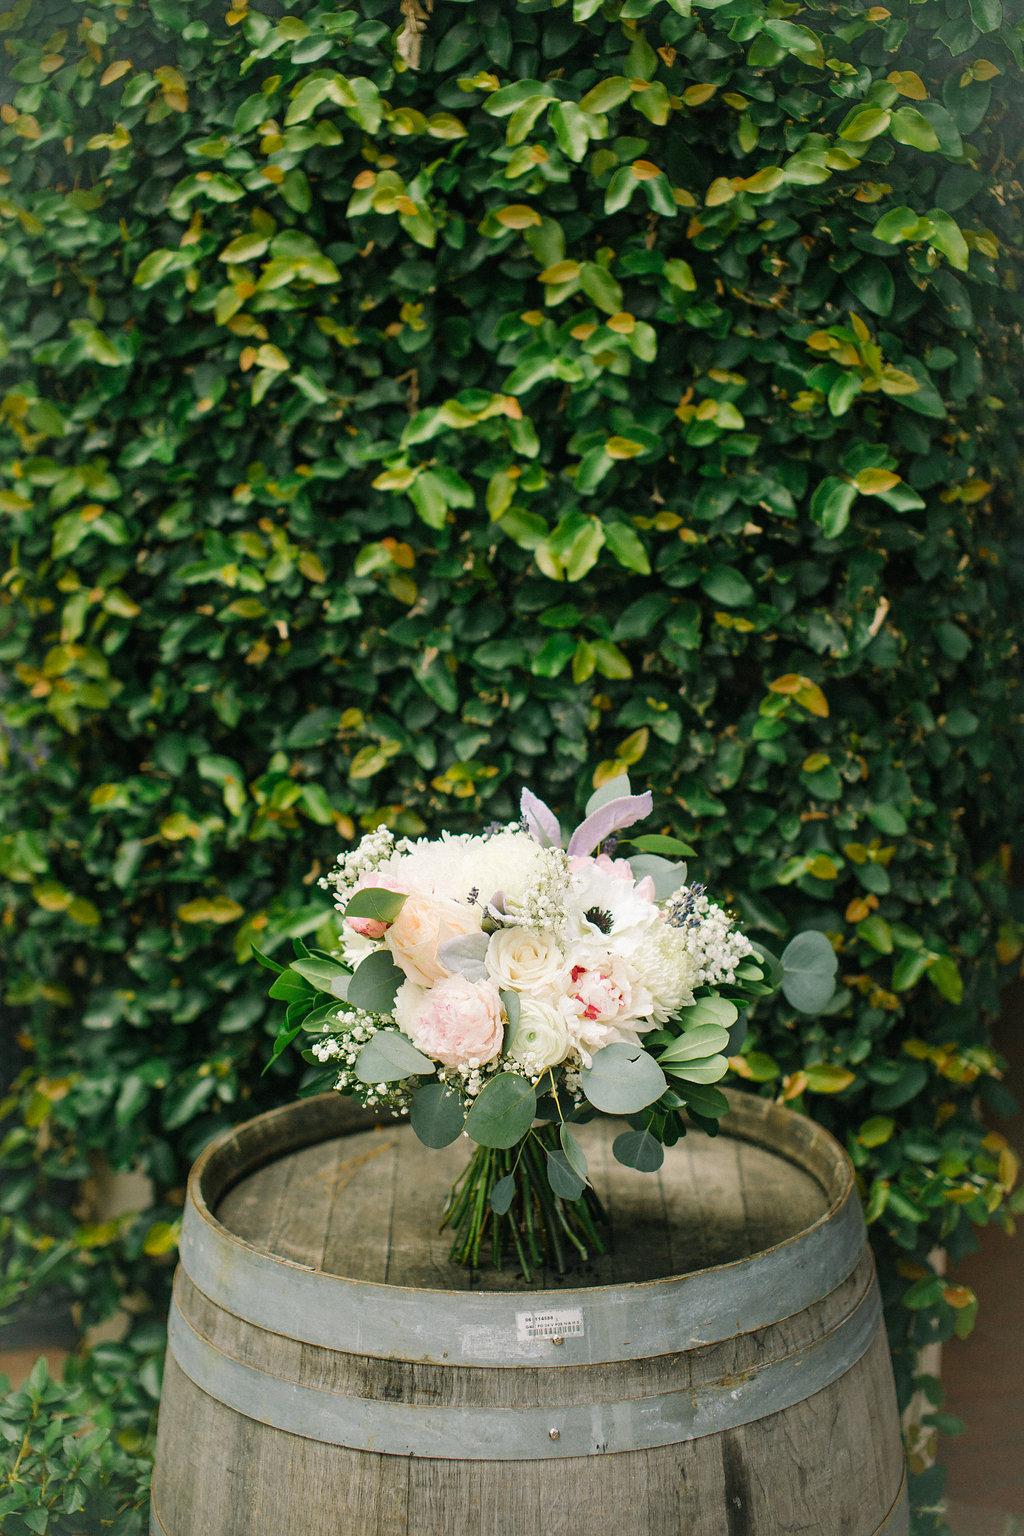 meagan-and-brenden-rach-loves-troy-photography-ivory-and-beau-bridal-boutqiue-ti-adora-wedding-dress-gold-lace-wedding-dress-savannah-wedding-planner-savannah-weddings-oldfield-plantation-wedding-savannah-florist-6.jpg